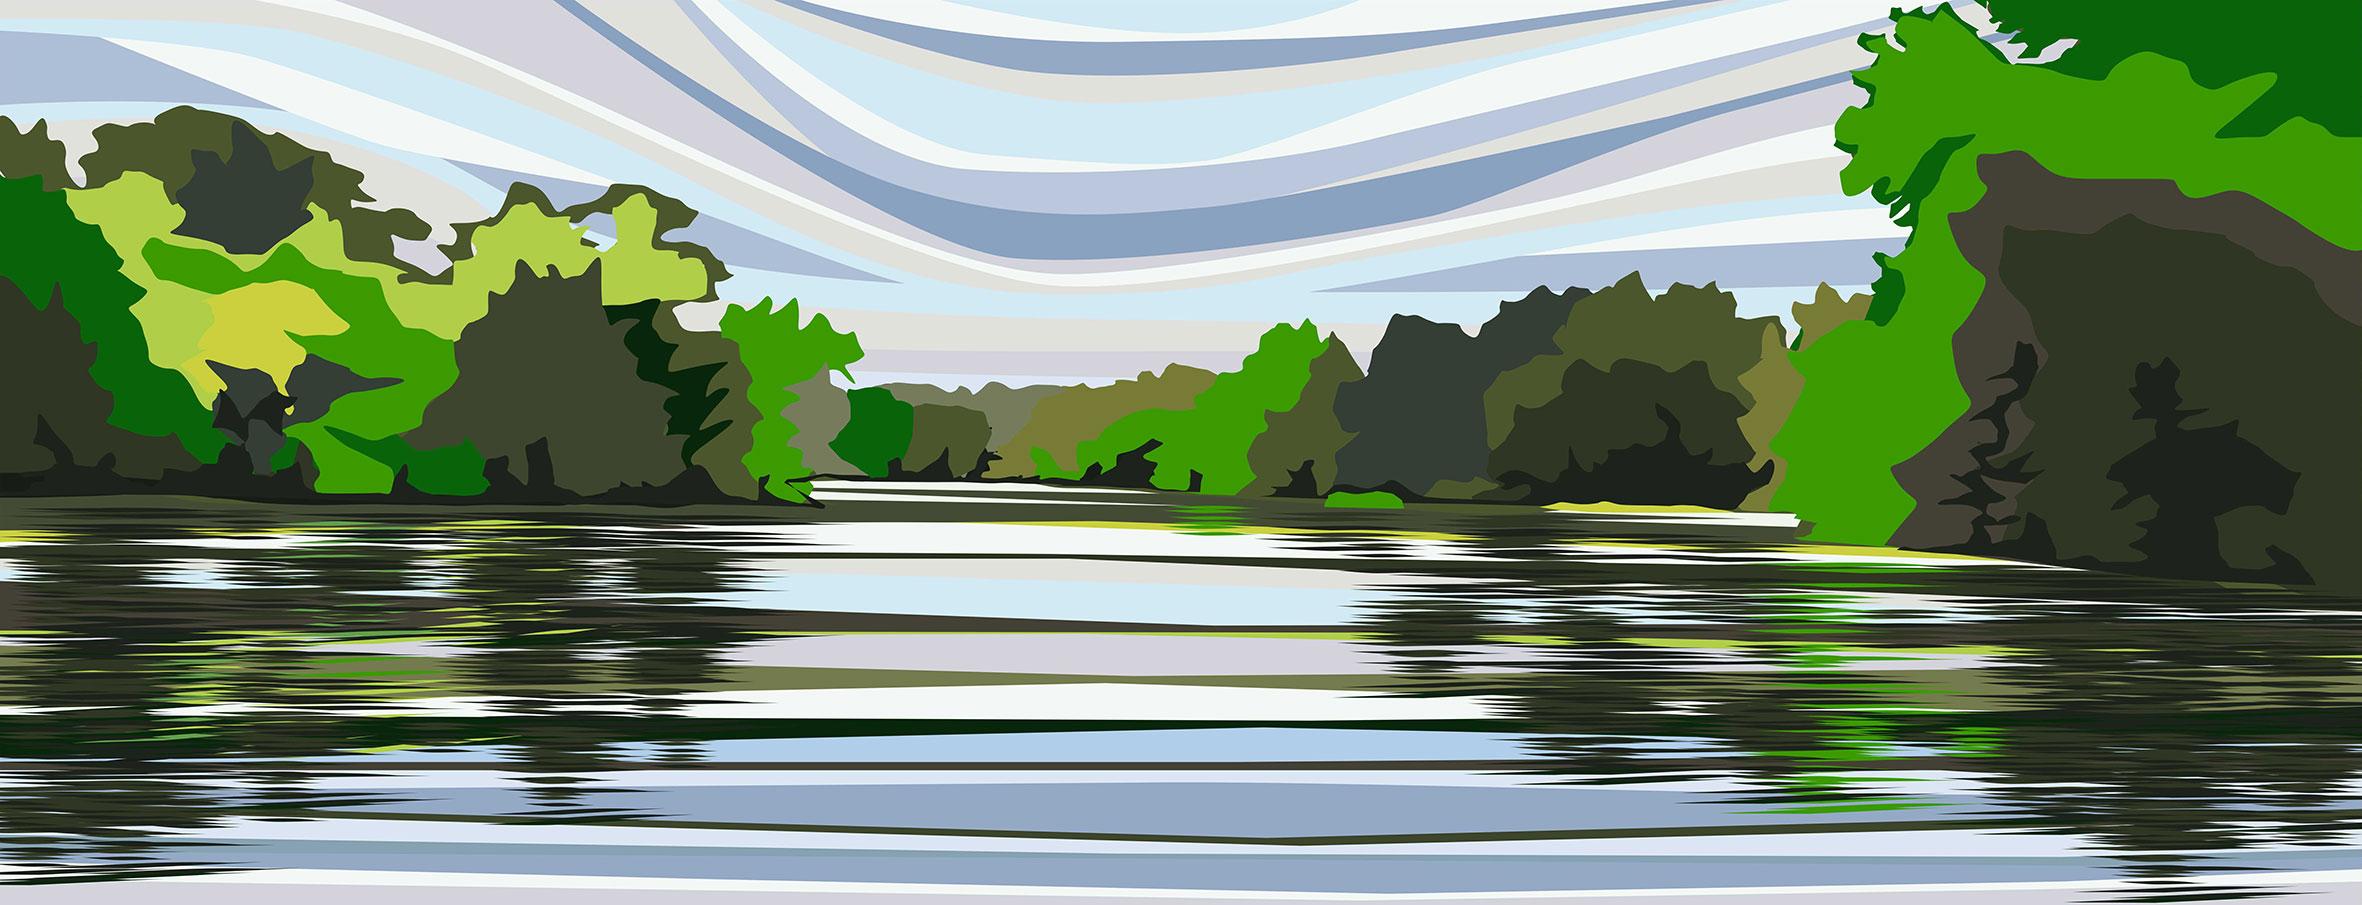 Higams Park Lake. 2020